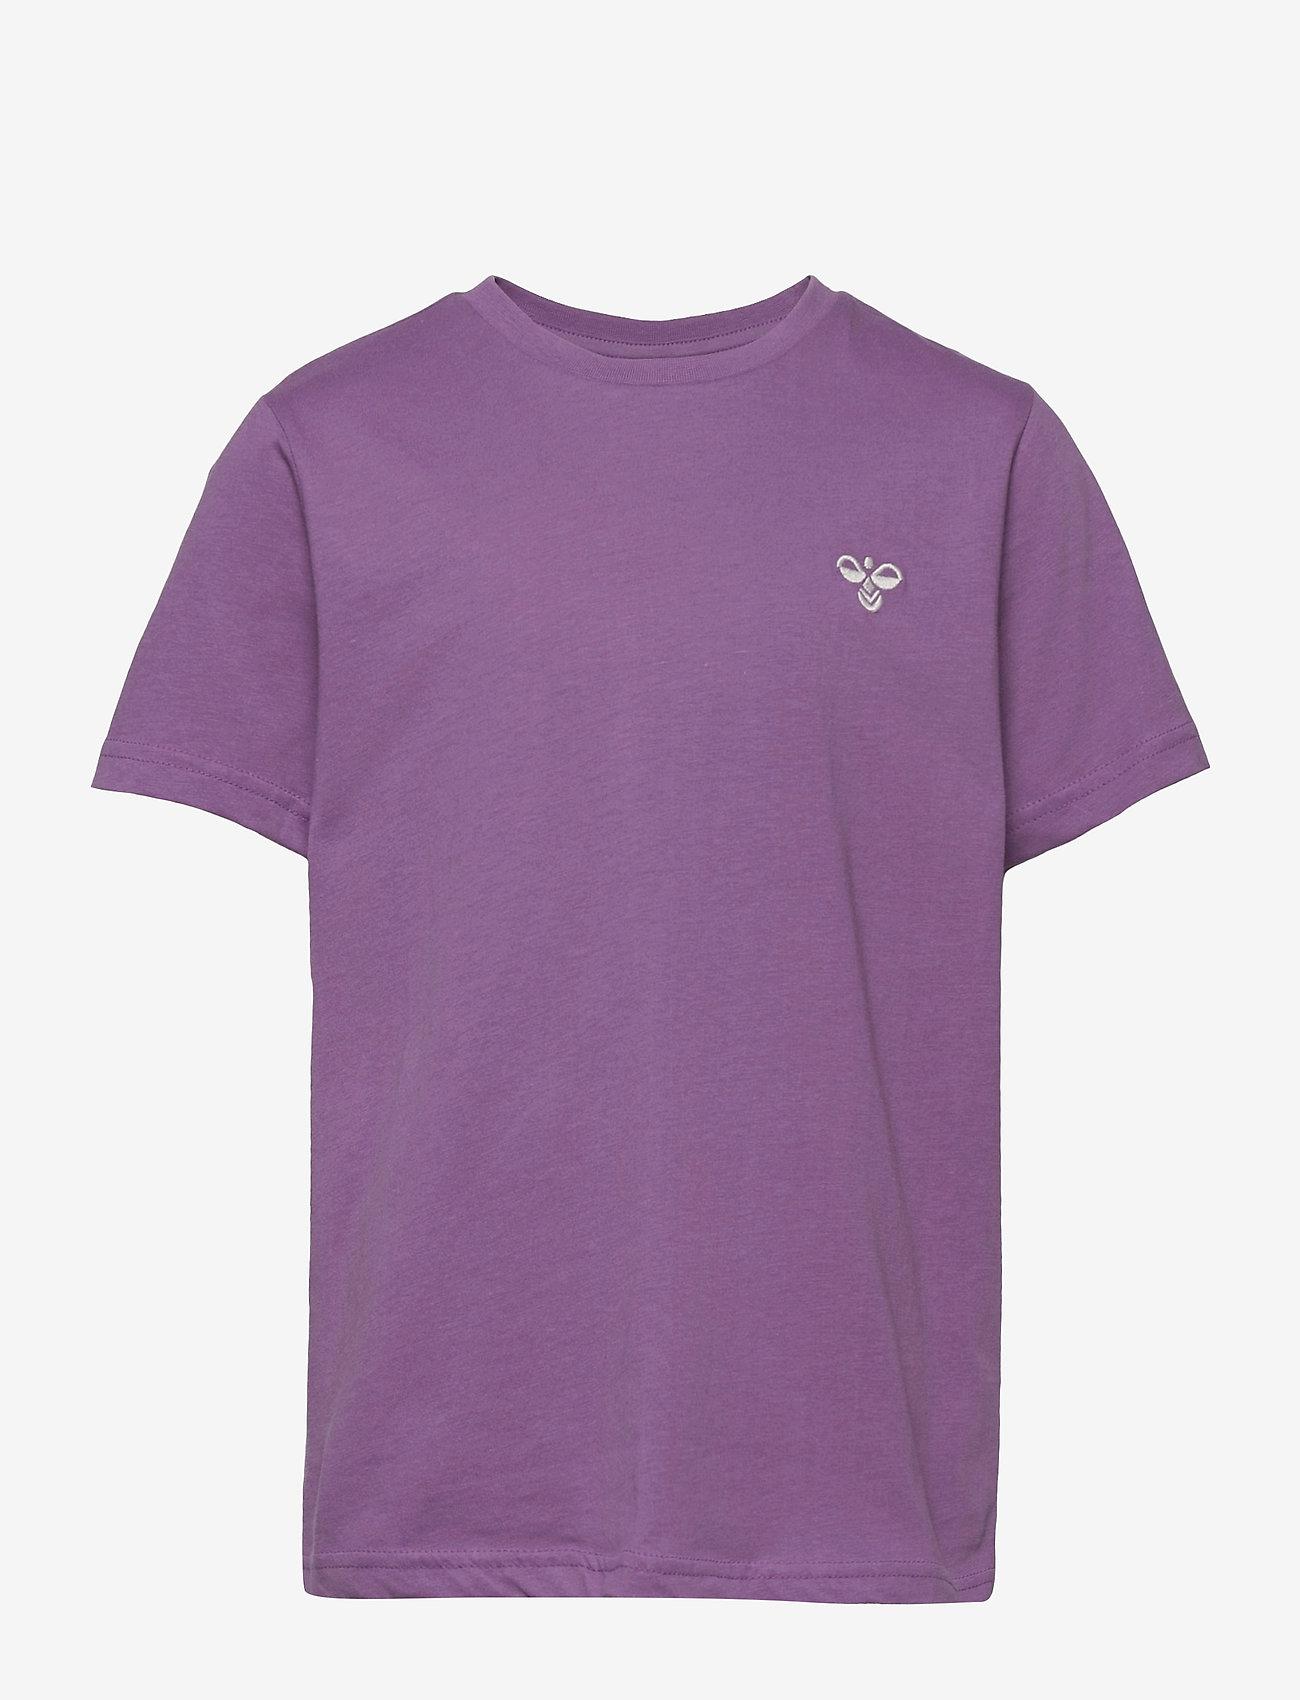 Hummel - hmlUNI T-SHIRT S/S - short-sleeved - chinese violet - 0